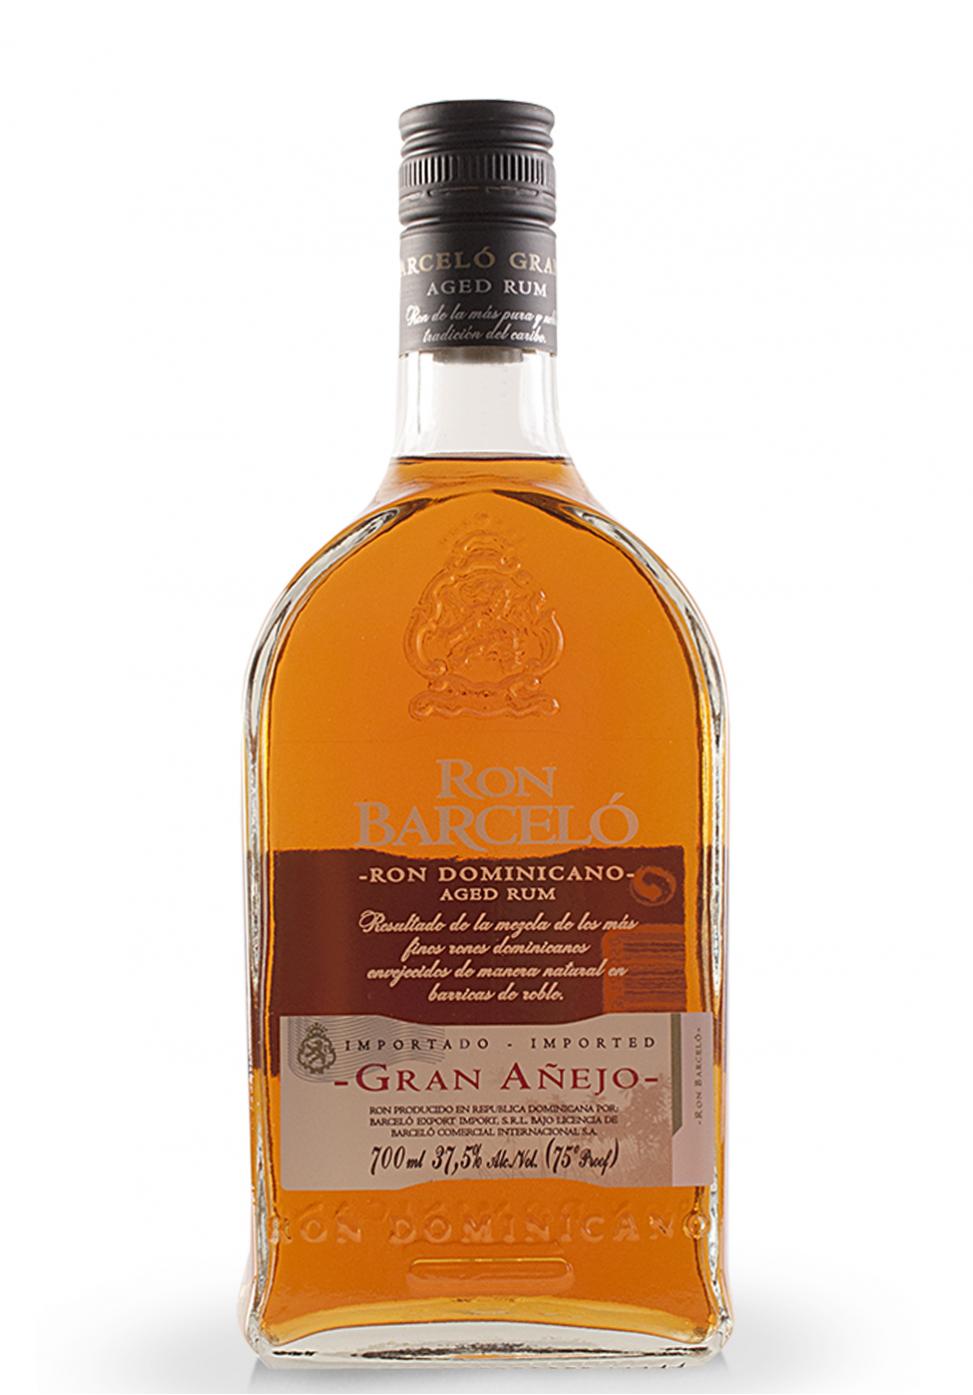 Ron Barcelo Rum Drinks